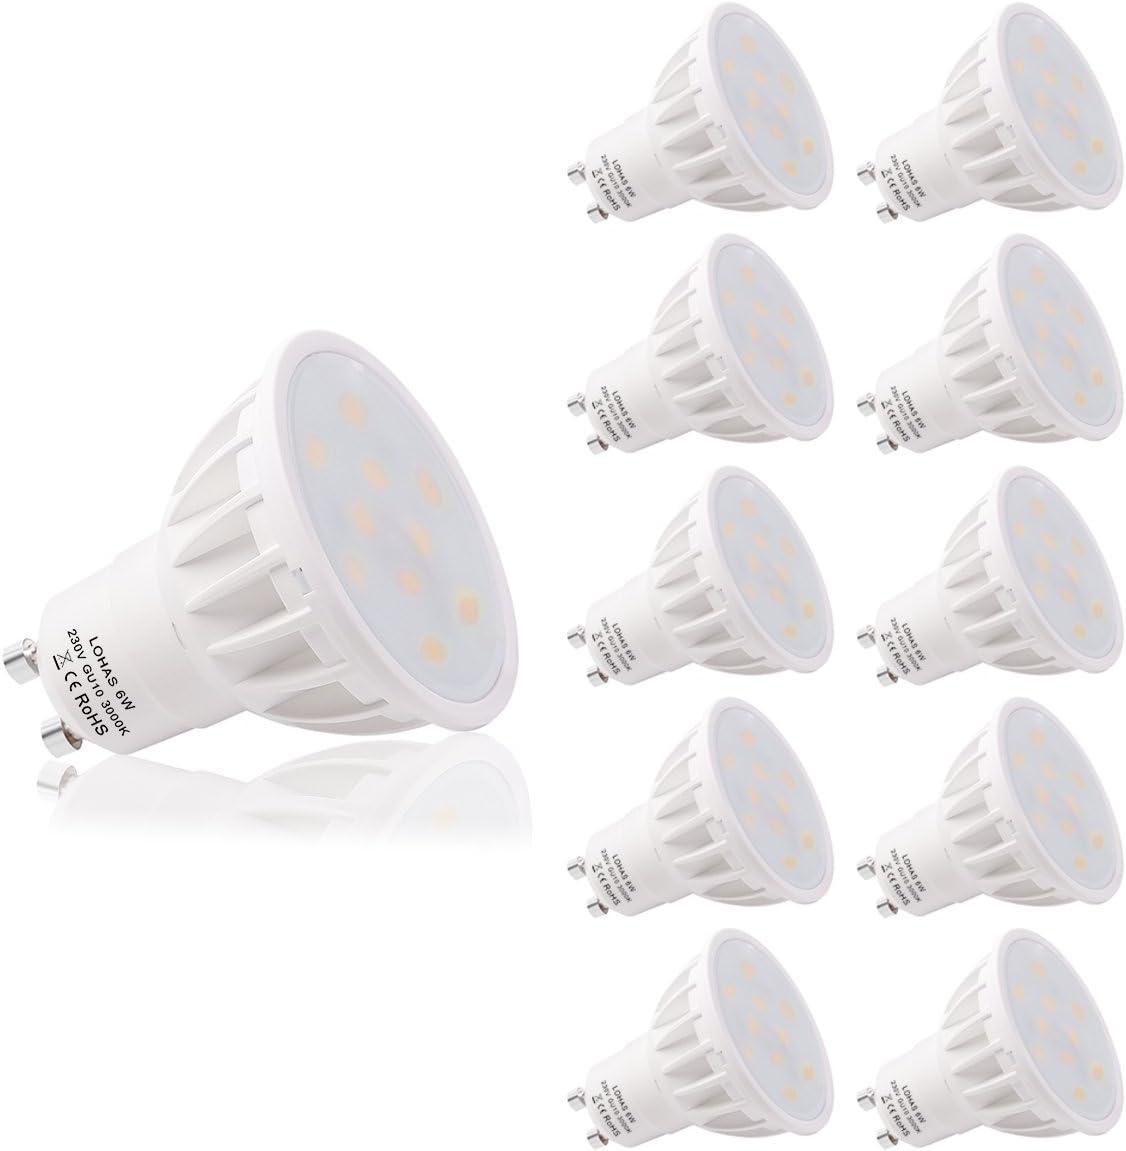 LOHAS Bombillas LED, GU10 6W Equivalente a 50W, Blanco Cálido 3000K, 500lm, No-Regulable, Paquete de 10 Unidades